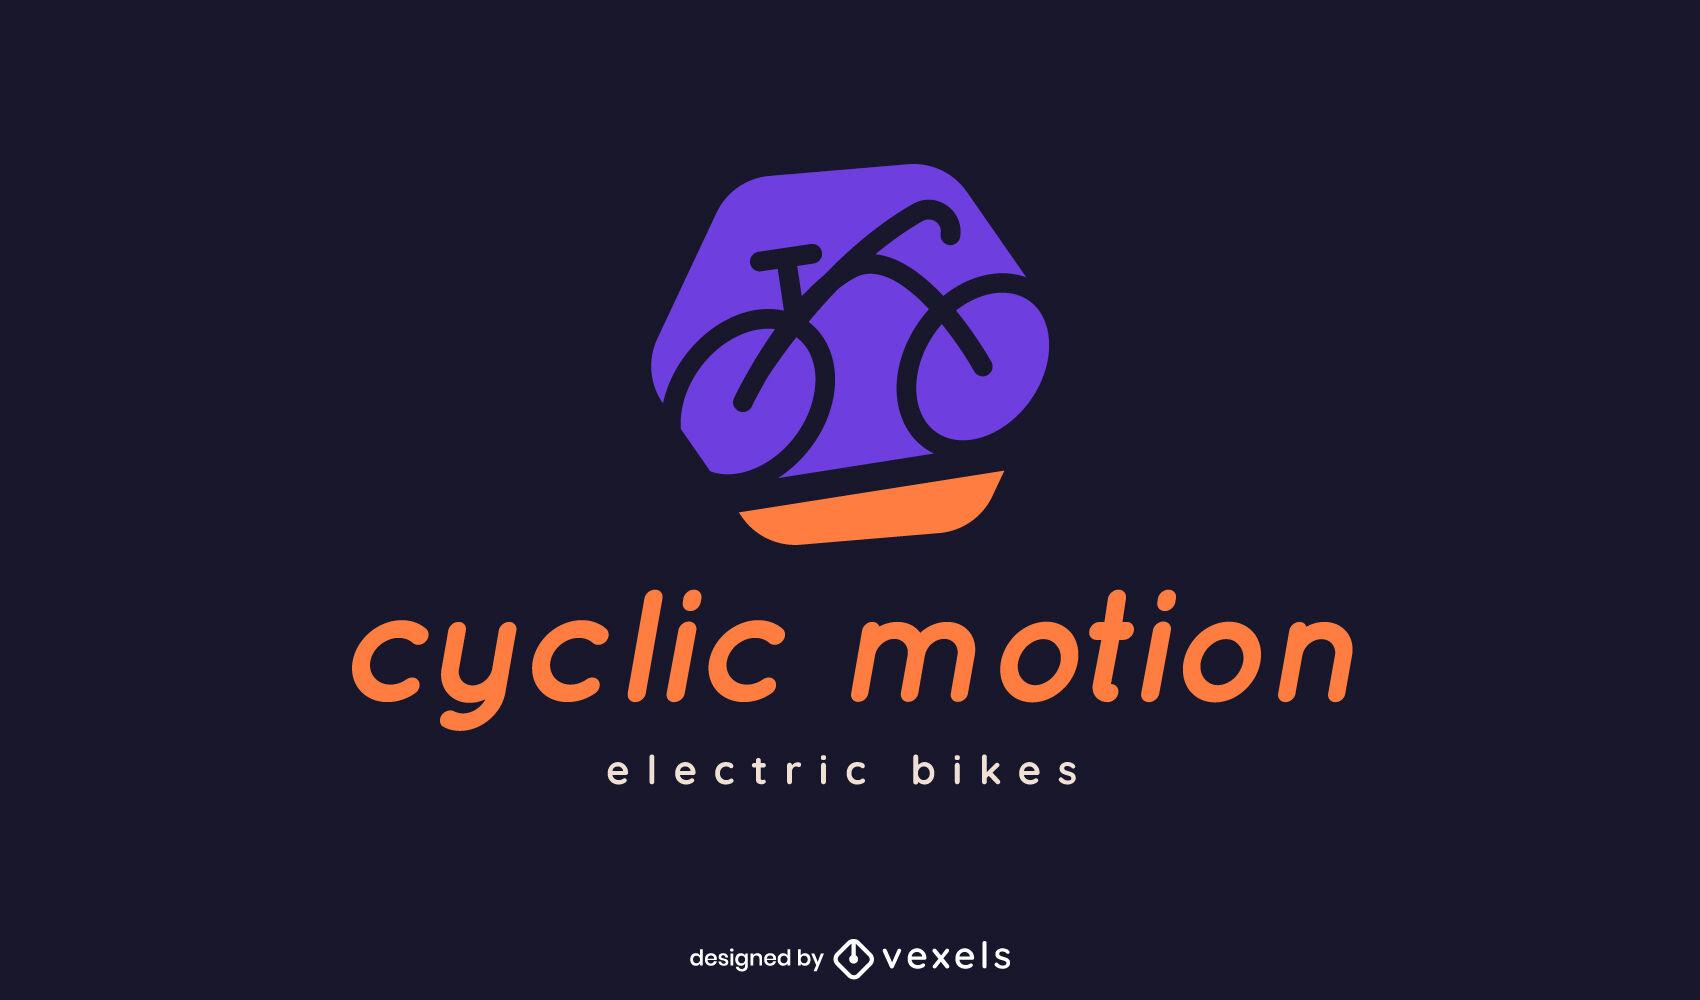 Fahrrad-Farblogo-Vorlage